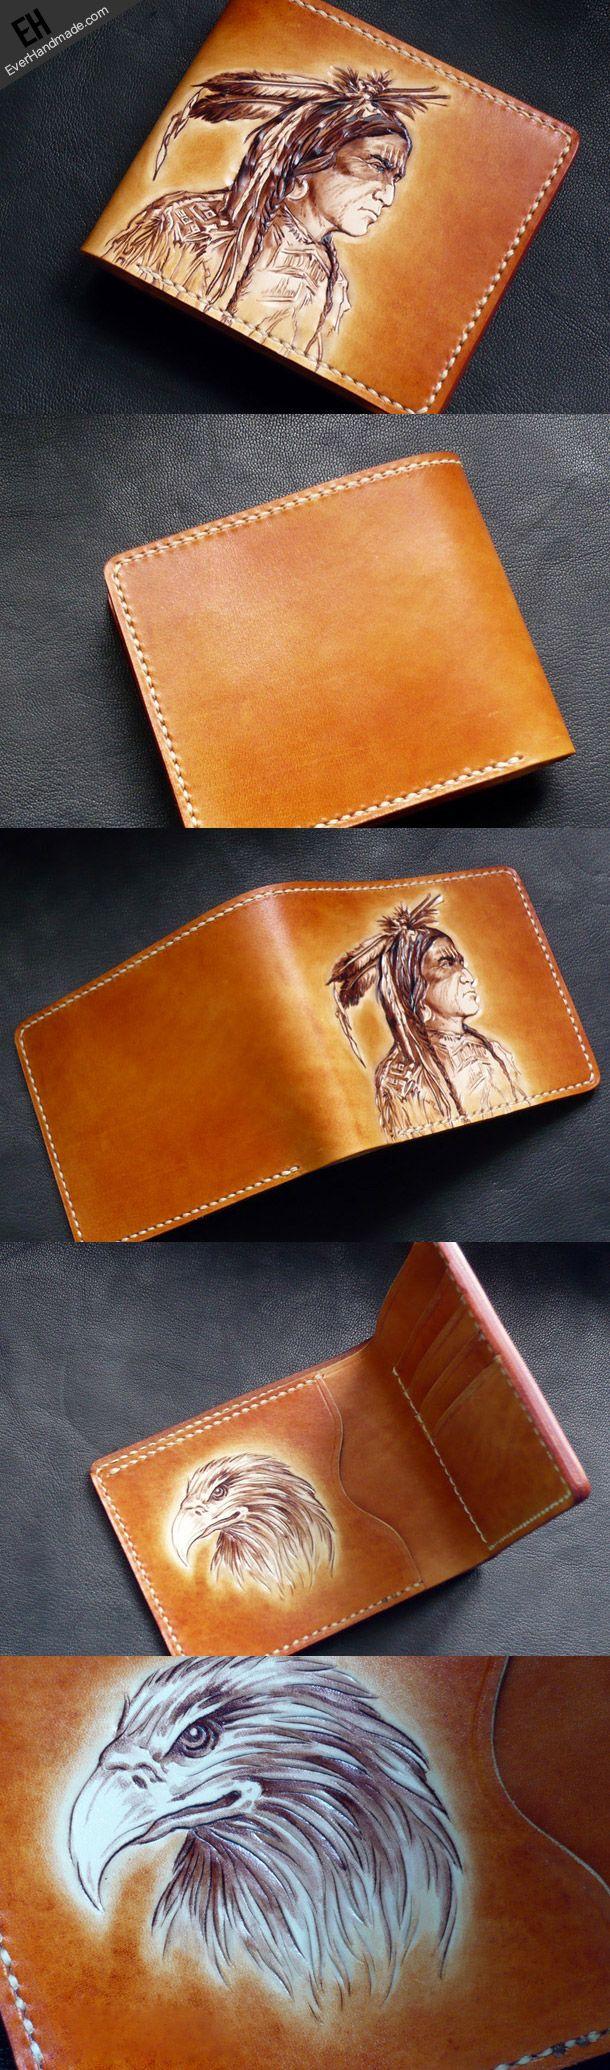 Handmade short leather wallet men indian Chief carved leather short wallet for men him